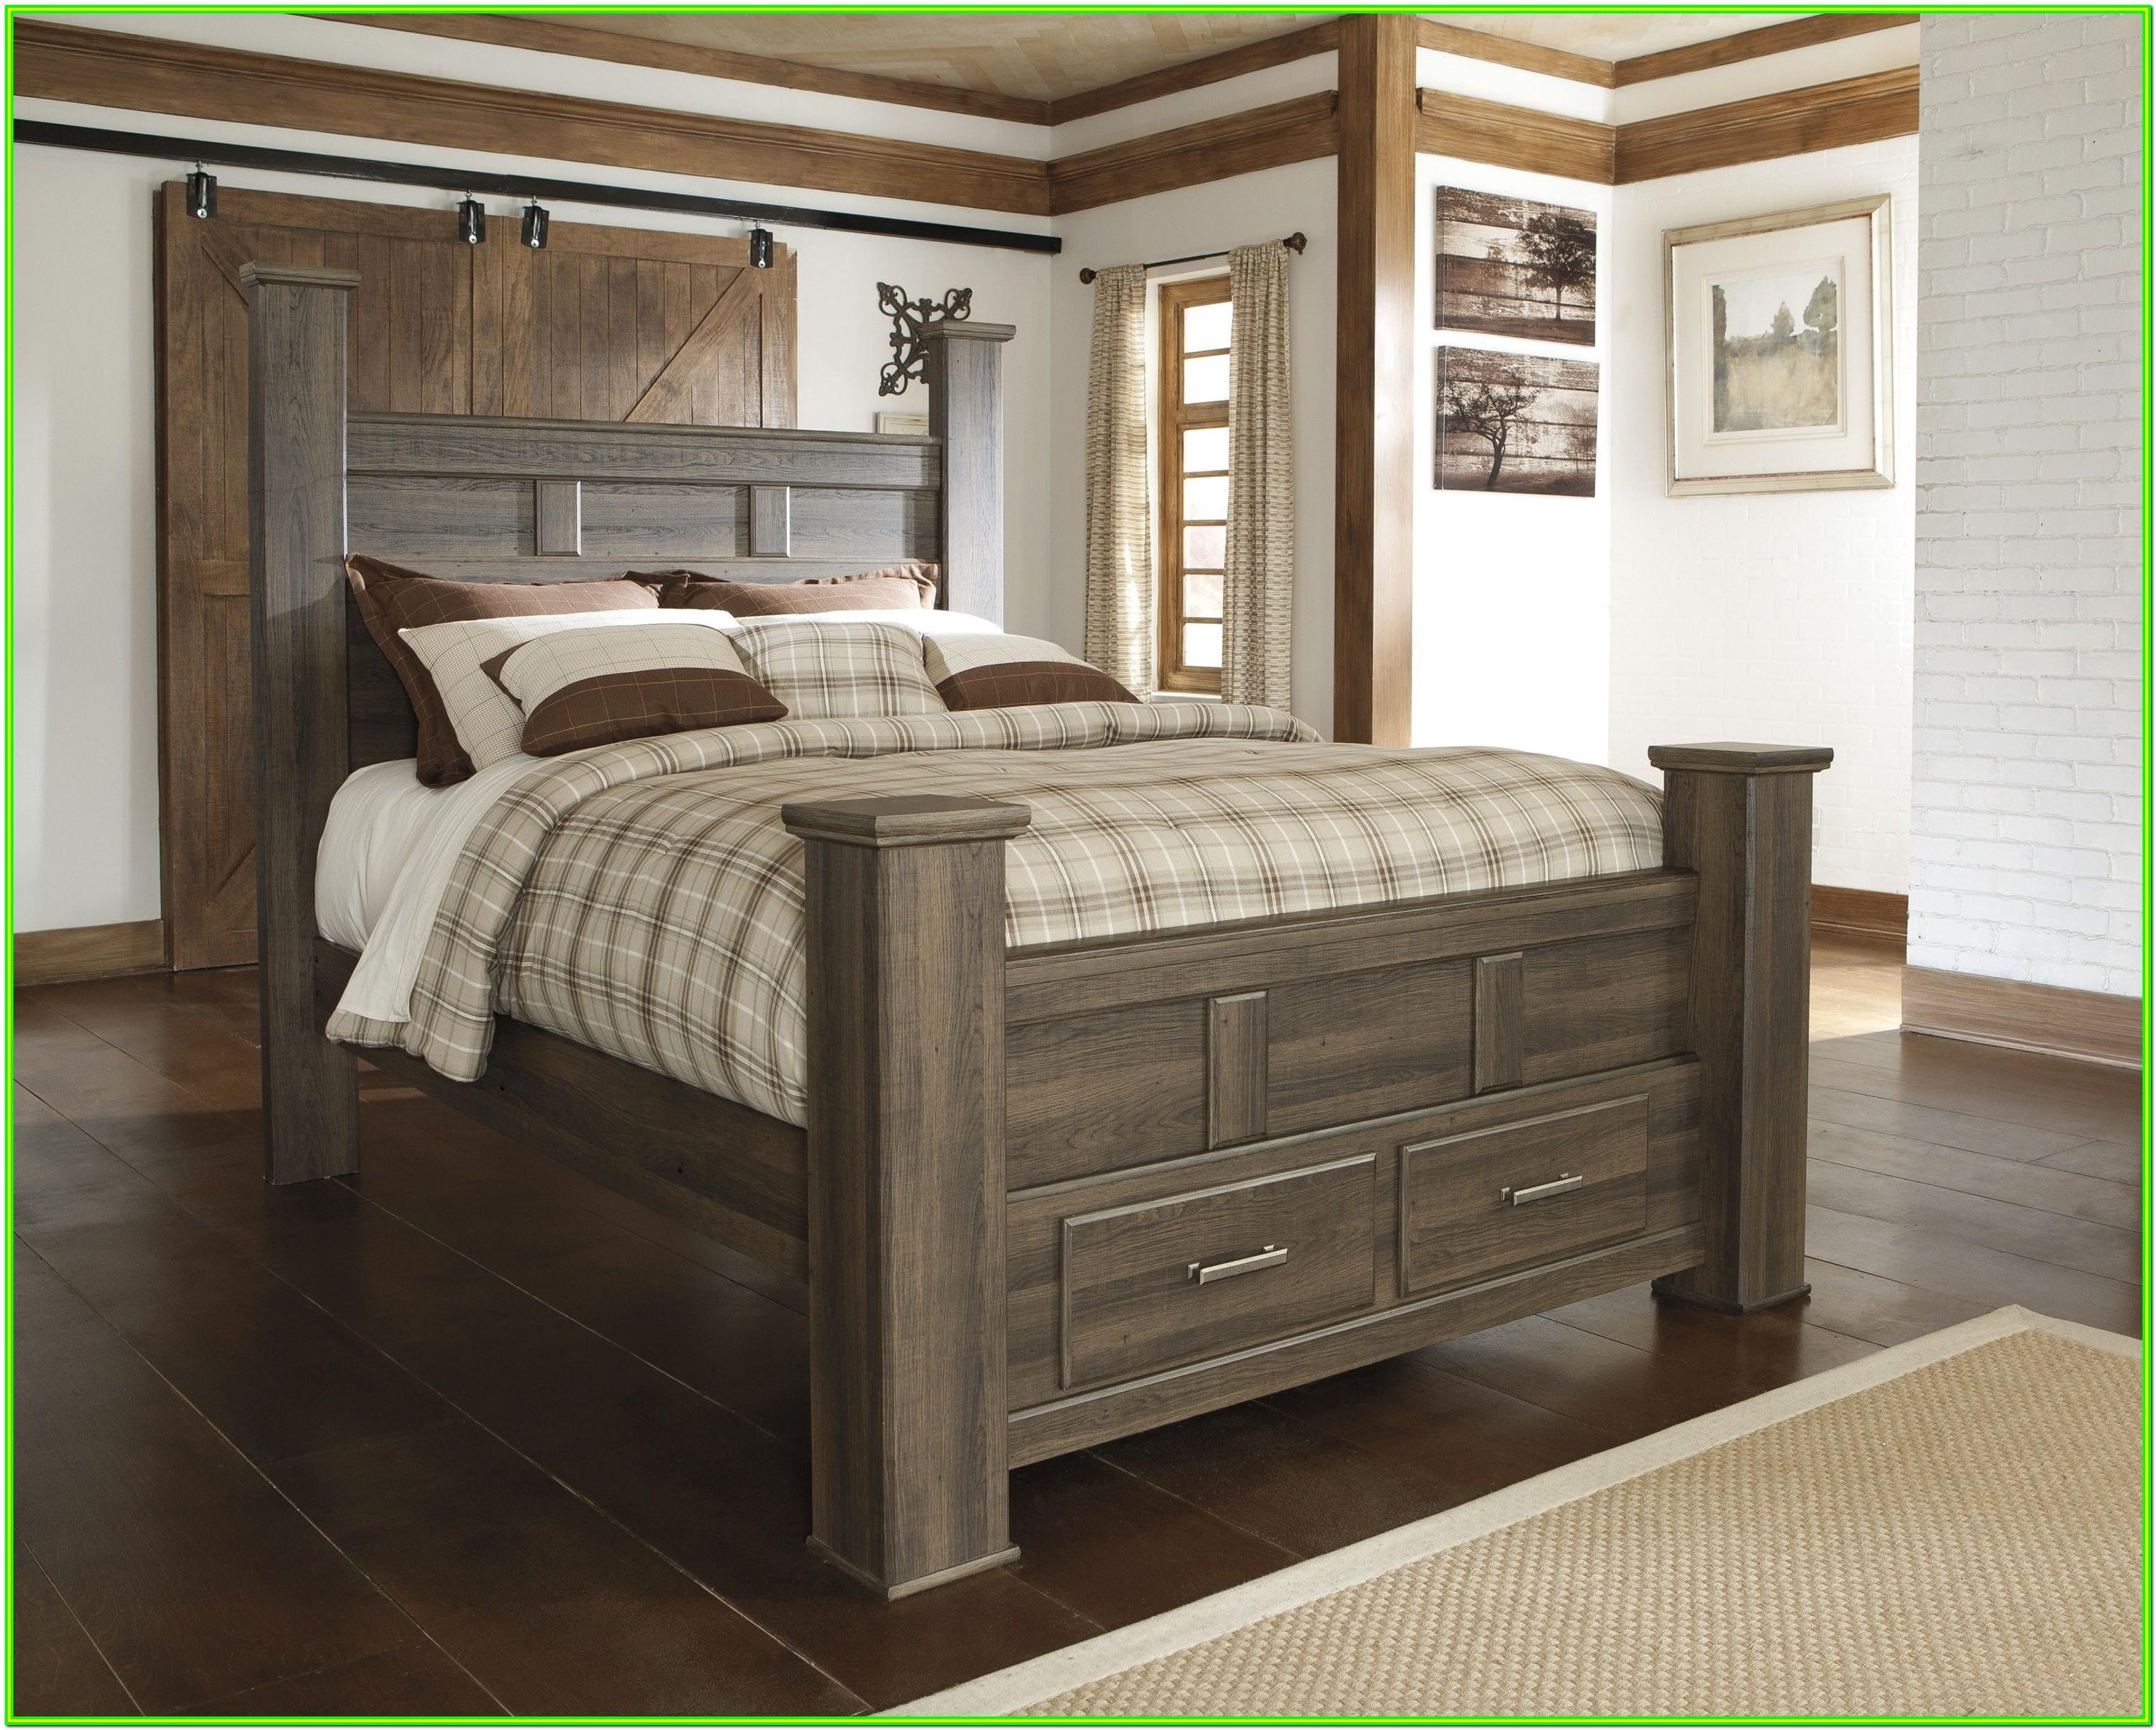 Ashley Furniture Bunk Bed Hardware